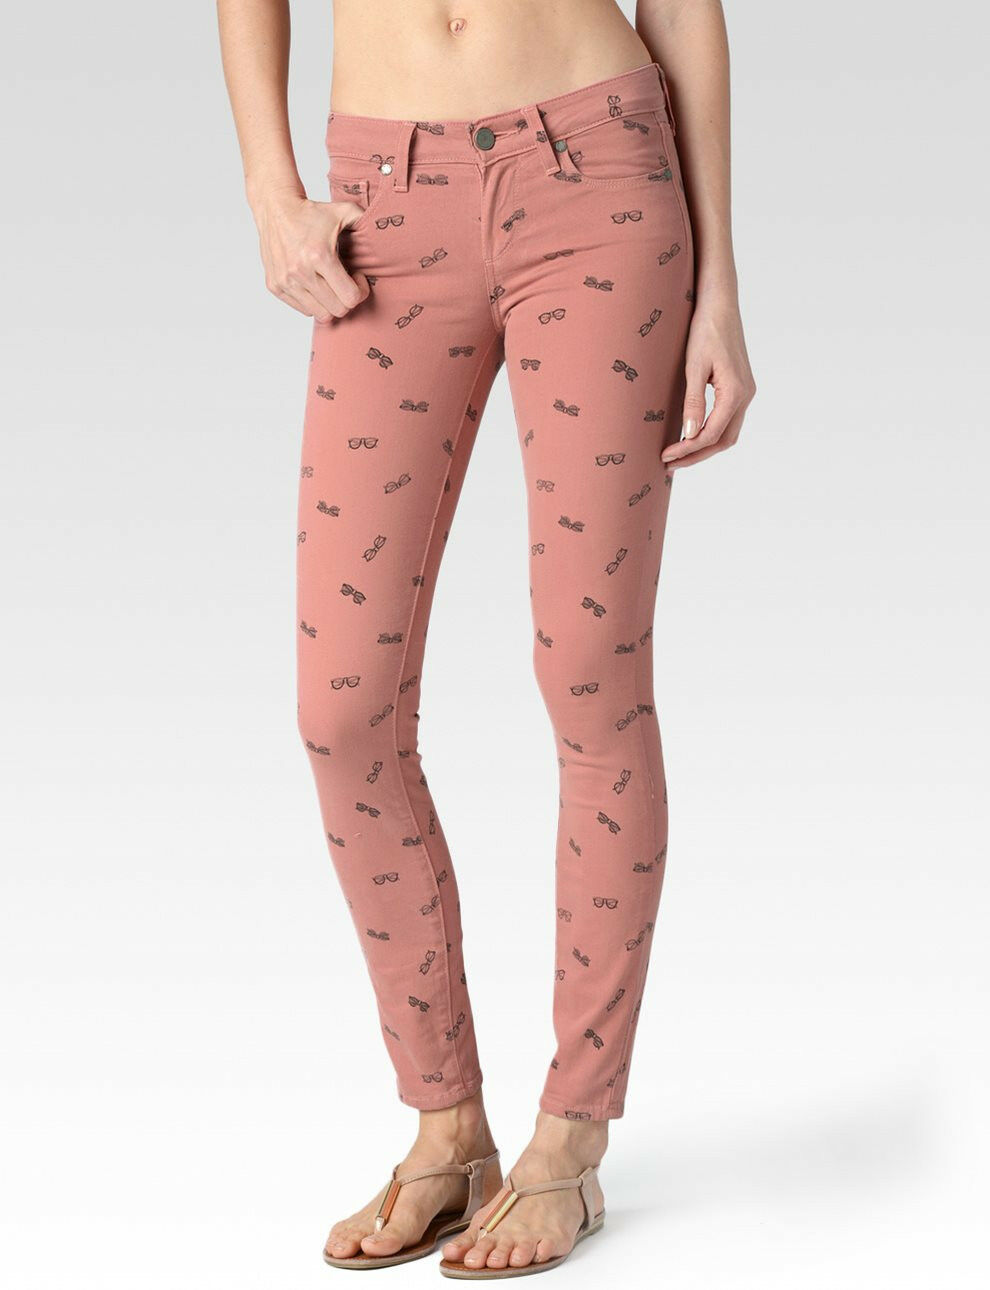 Paige Pink Sunnies Sunglass Print Verdugo Ankle Jeans Sz 25 New